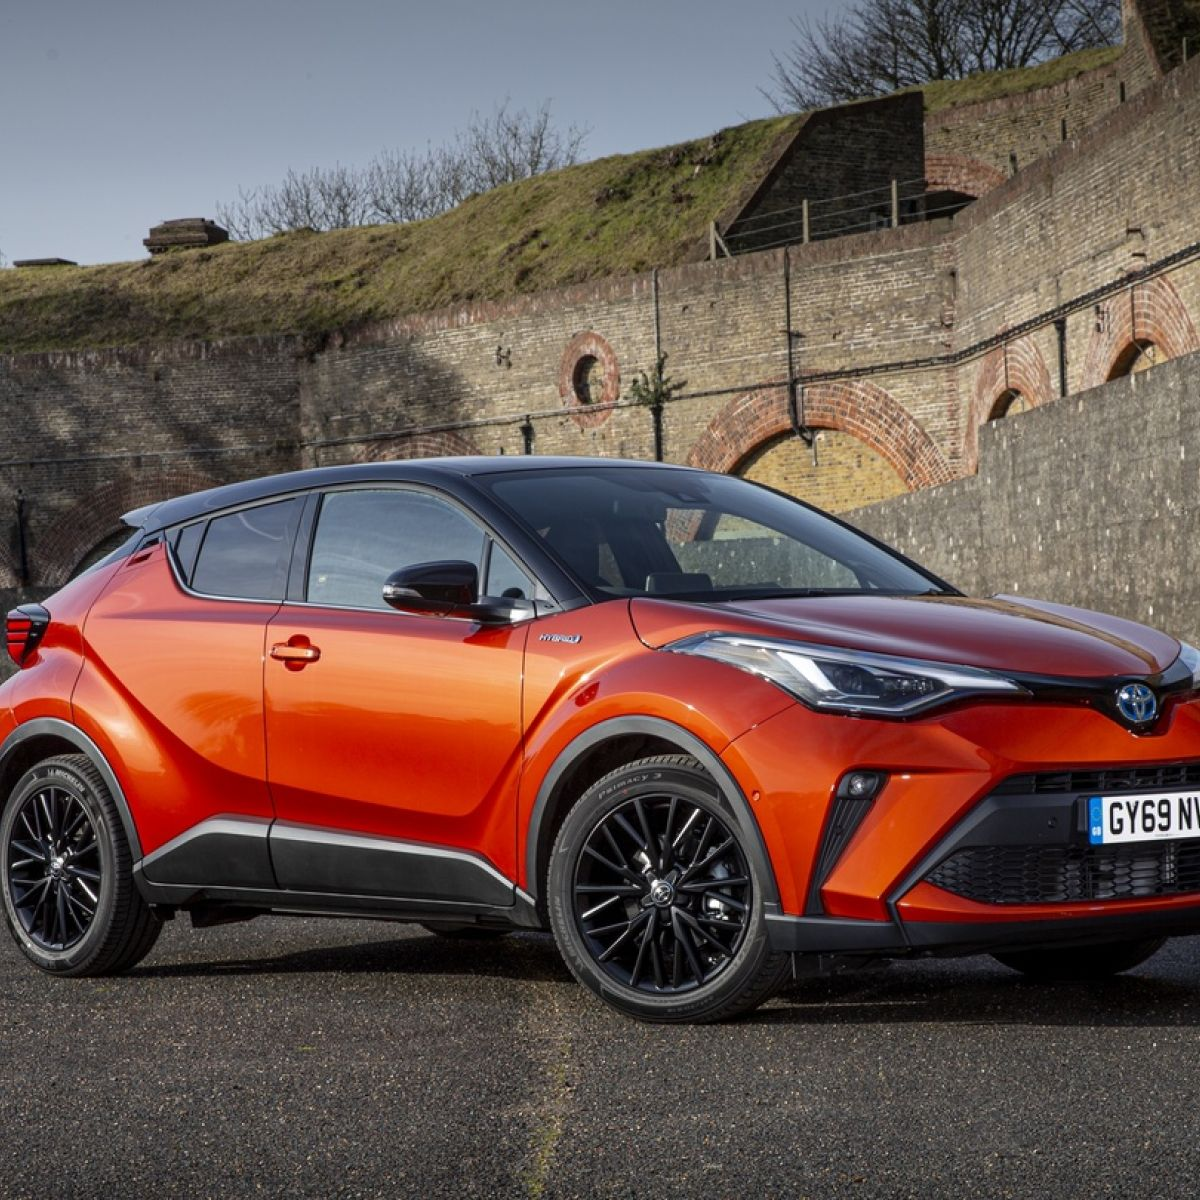 Kelebihan Kekurangan Toyota Premium Spesifikasi